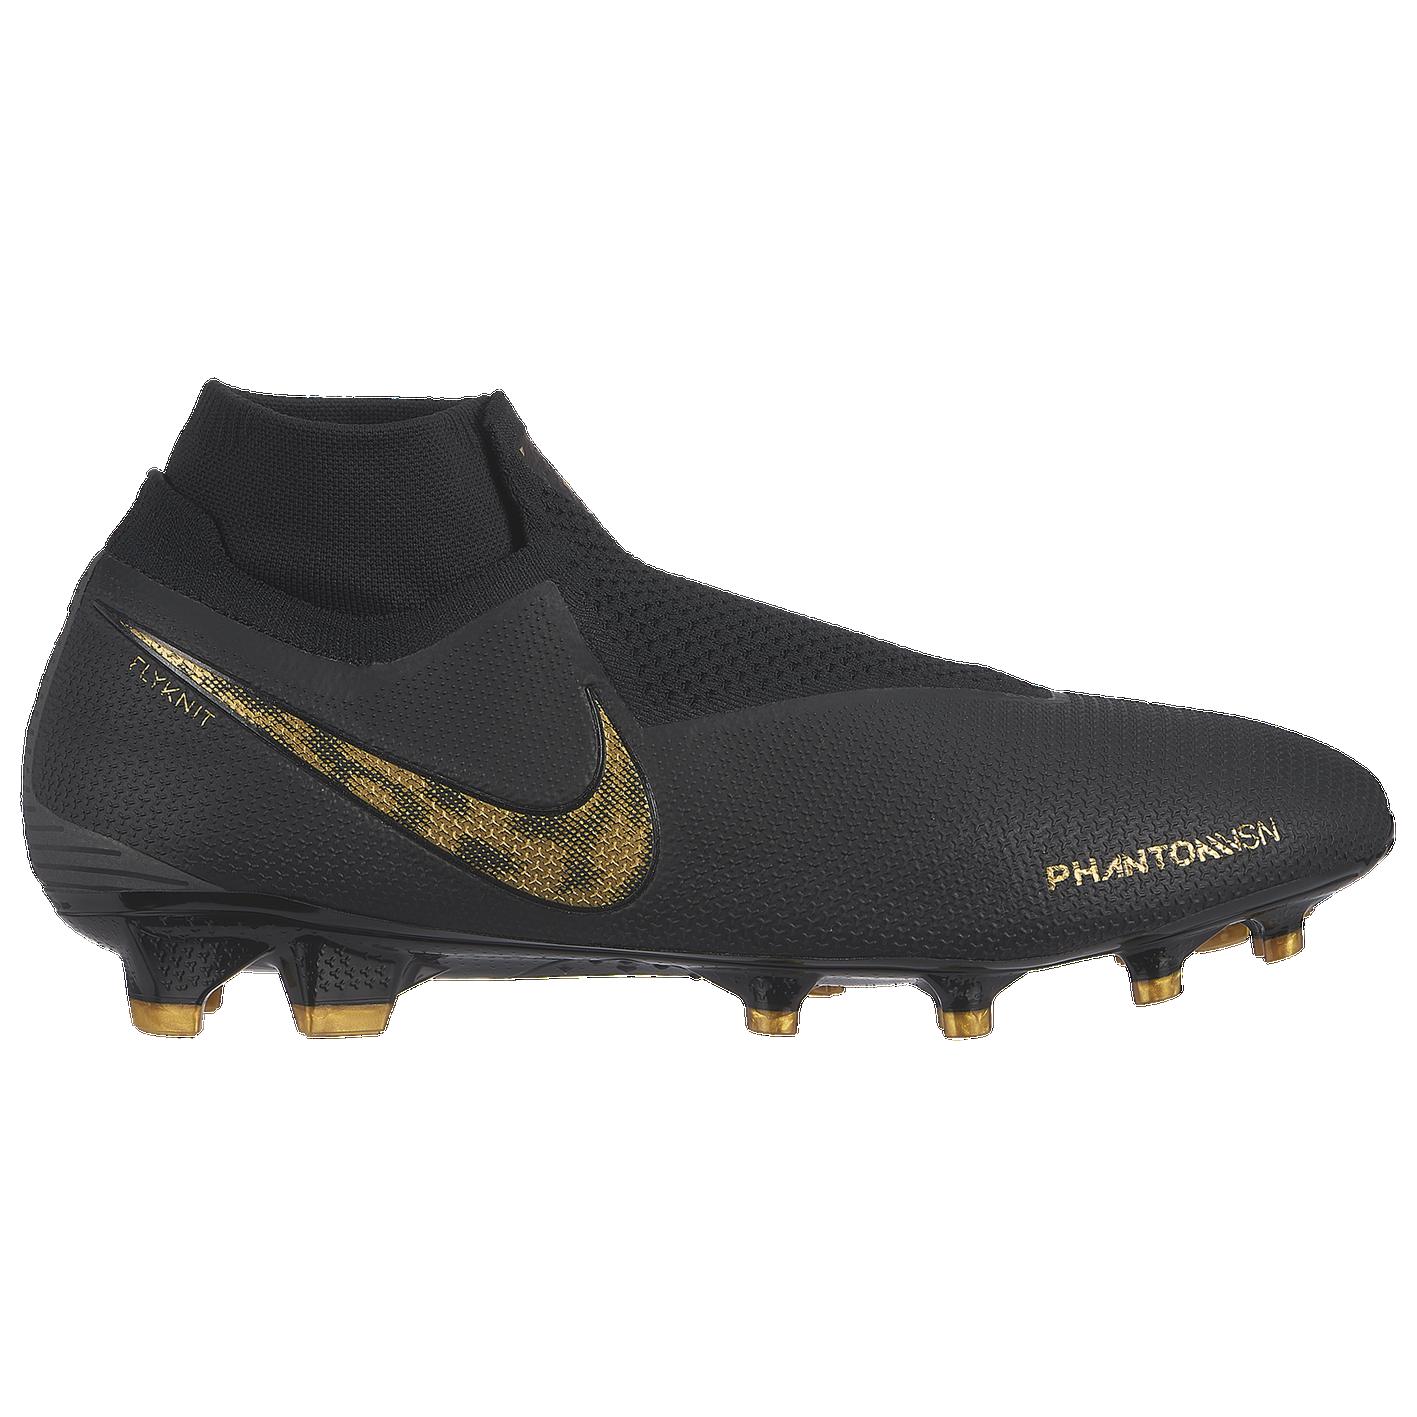 86fd71d9a32 Nike Phantom Vision Elite DF FG - Men s - Soccer - Shoes - Black ...